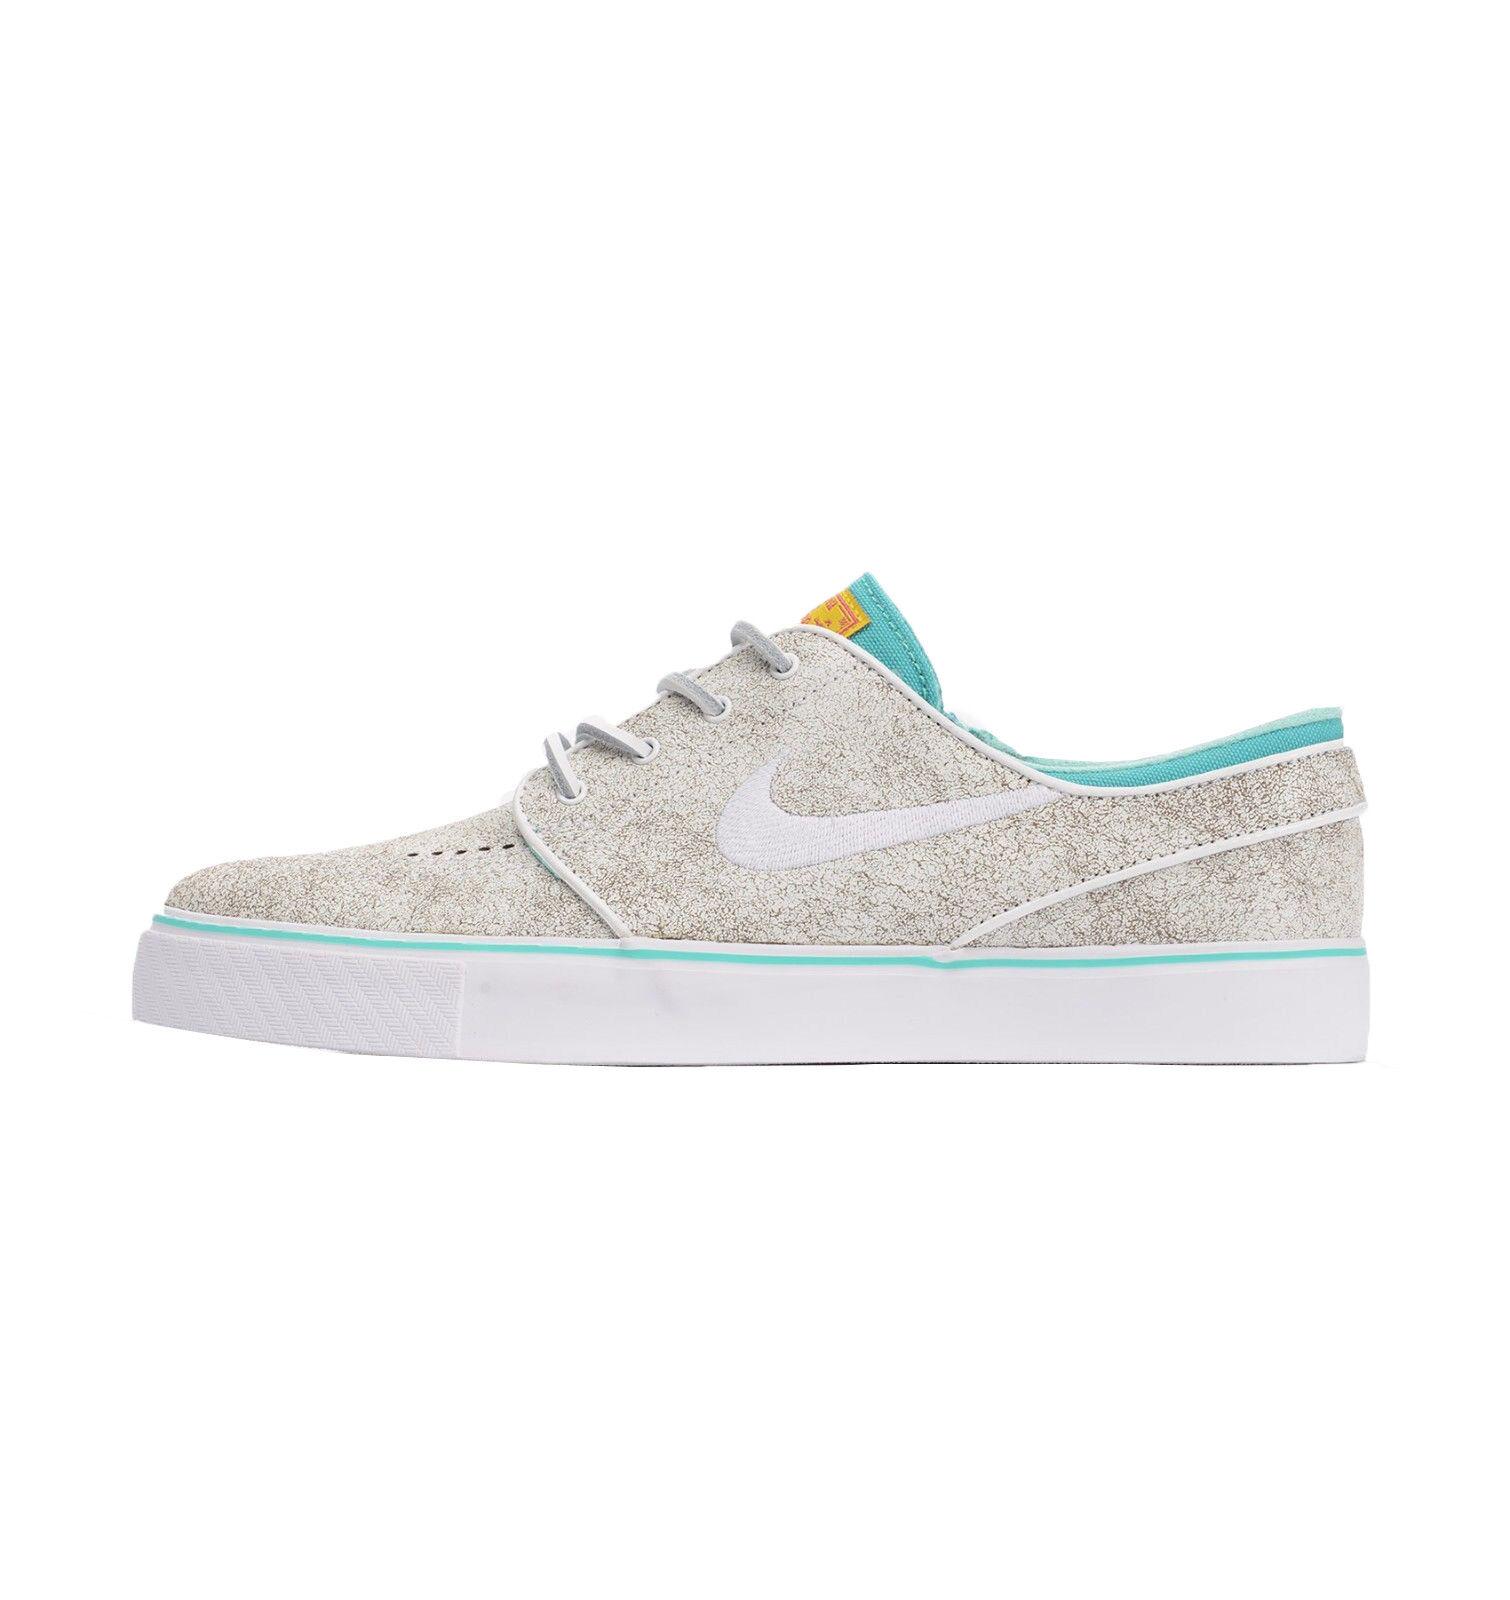 Nike ZOOM STEFAN JANOSKI ELITE White Black Hyper Jade Discounted (549) Mens Shoe